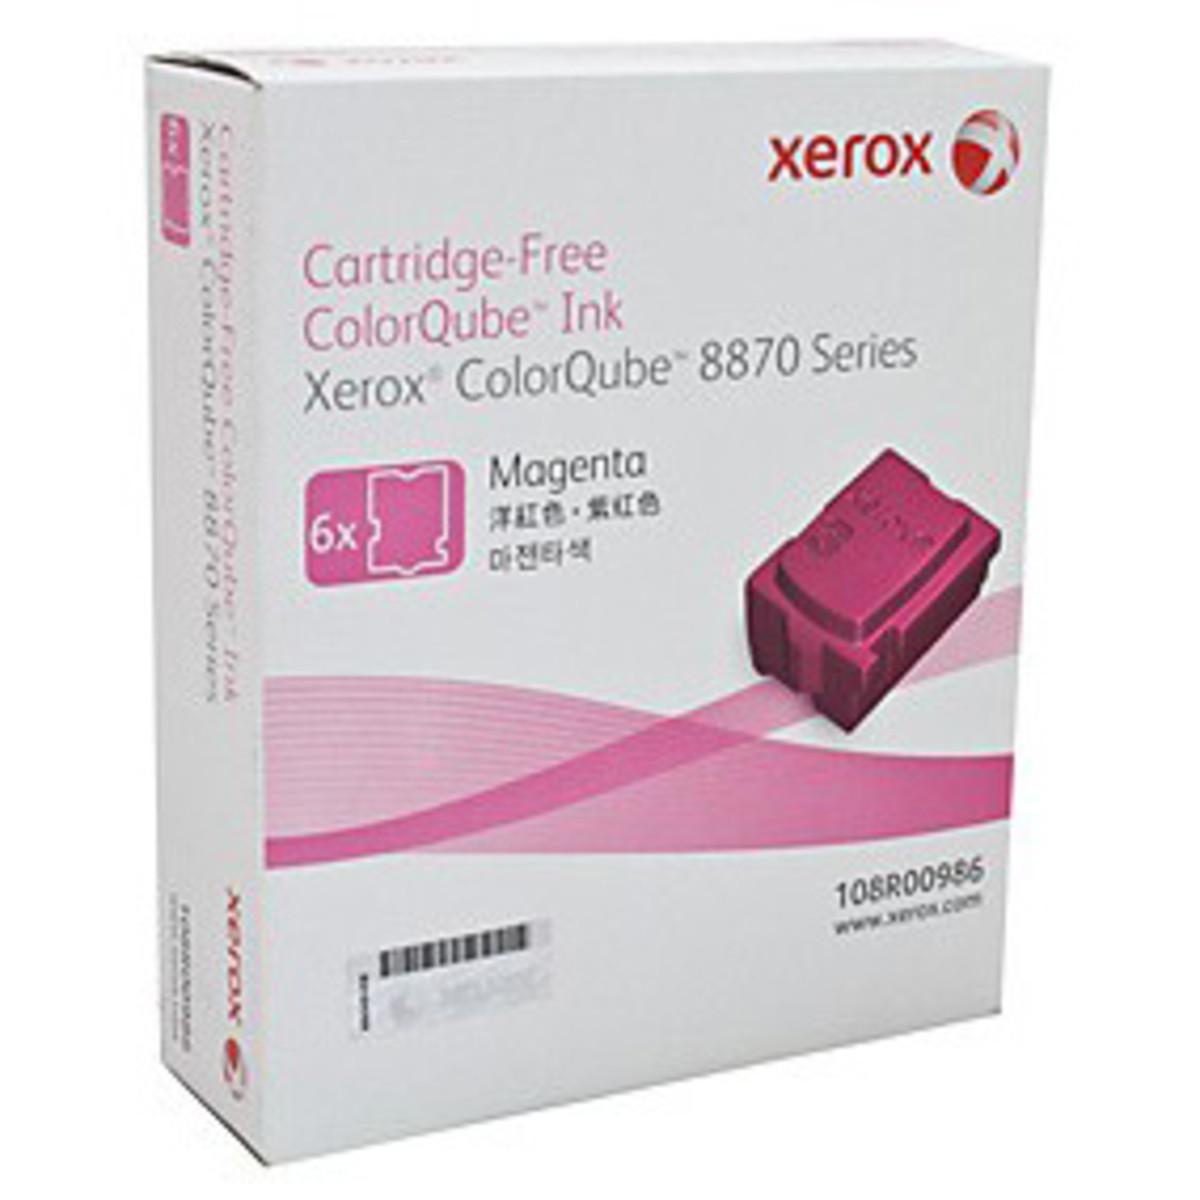 Xerox 108R00986 Magenta Solid Ink - 6 Pack